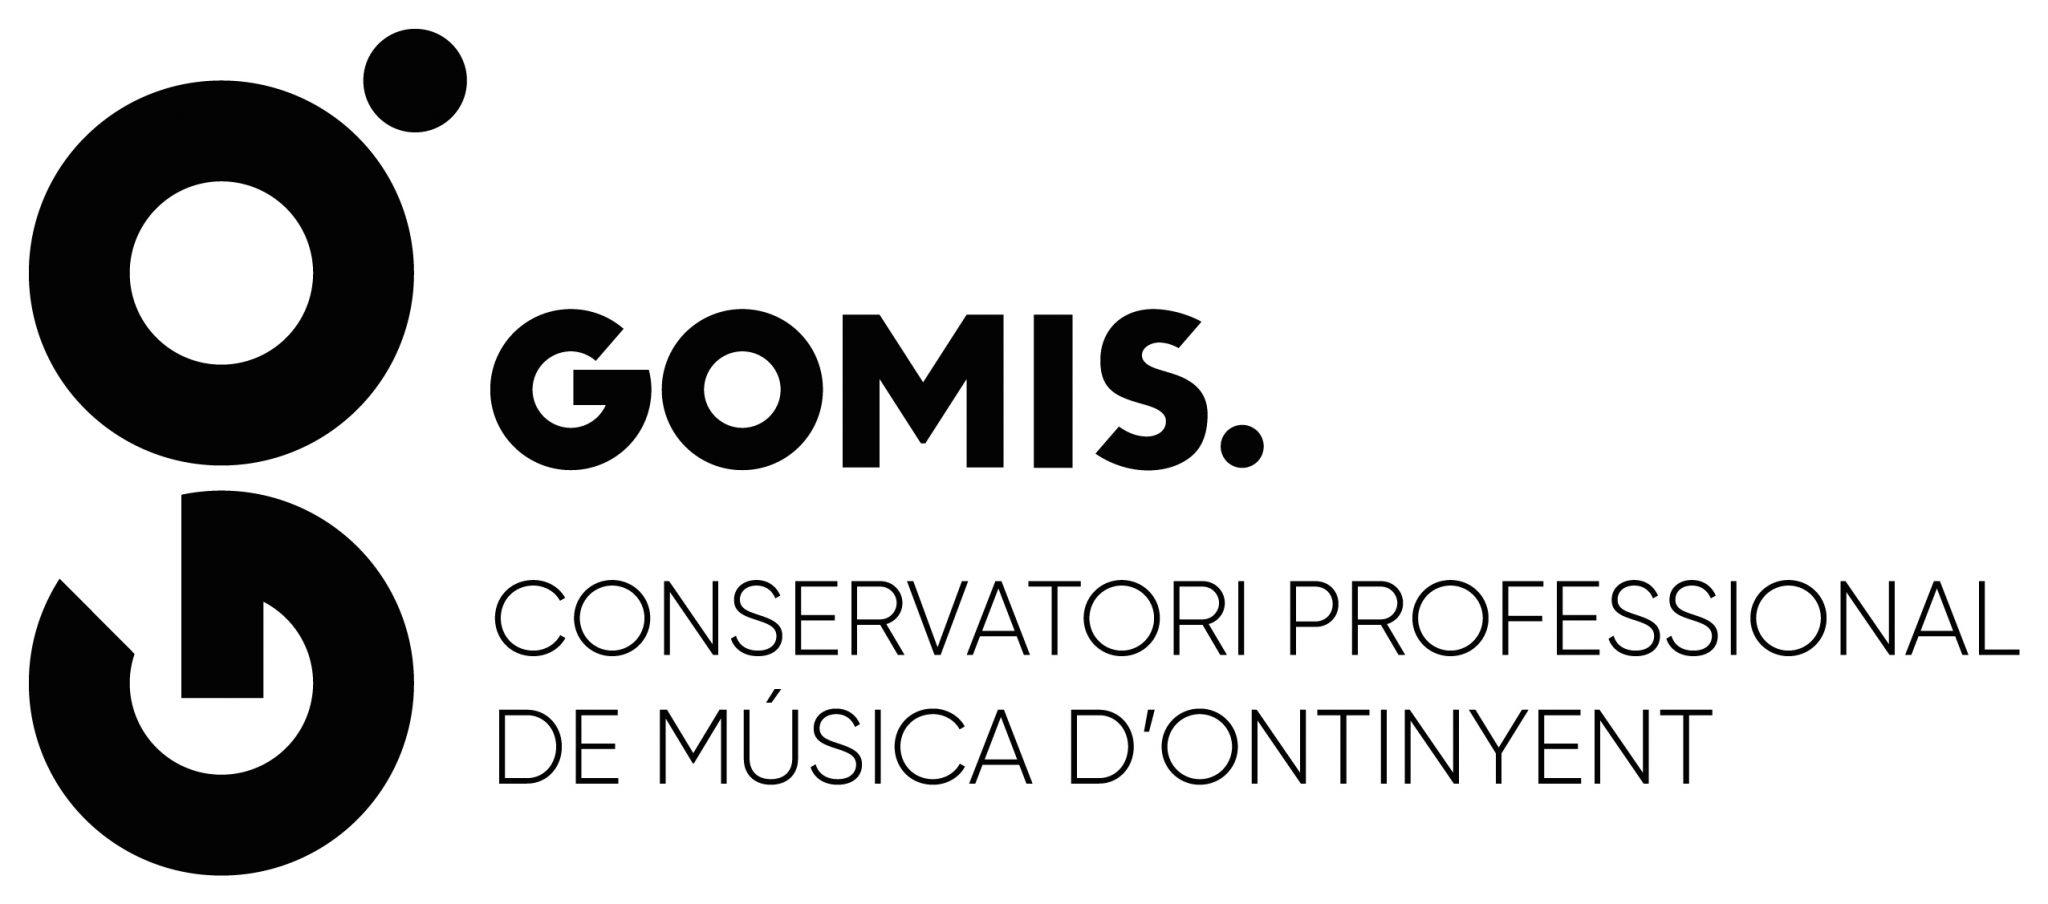 CONSERVATORI PROFESSIONAL DE MÚSICA JOSEP MELCIOR GOMIS